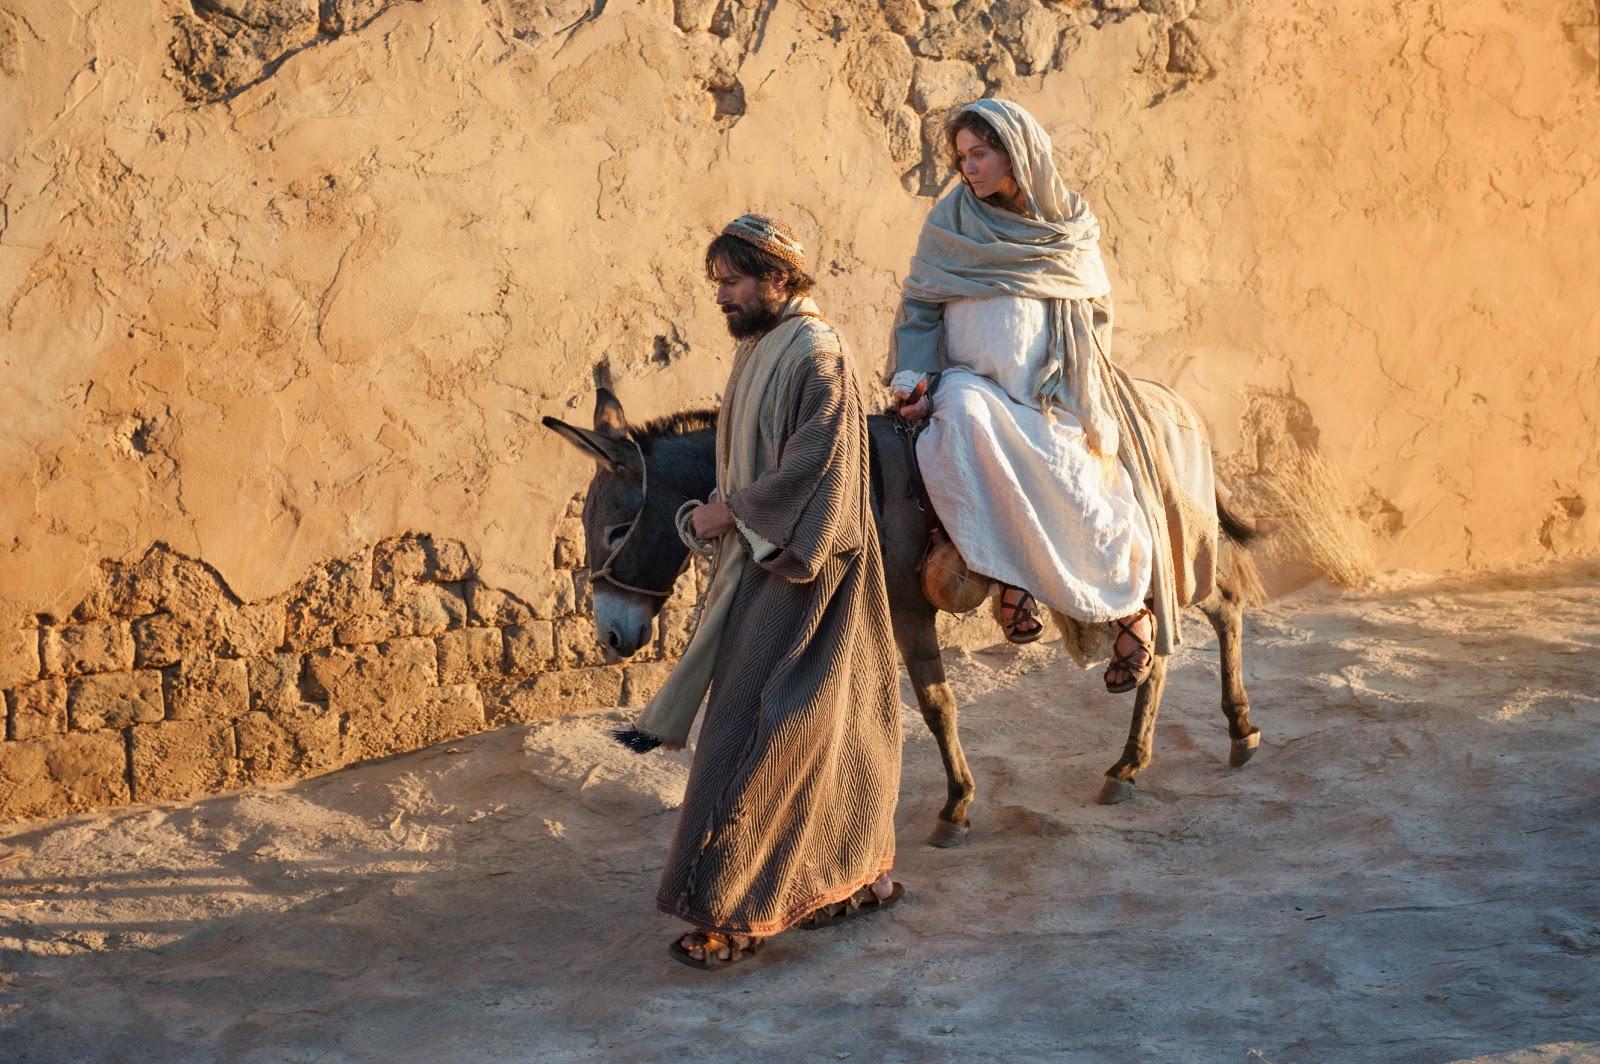 mary-joseph-journey-to-bethlehem-958711-print